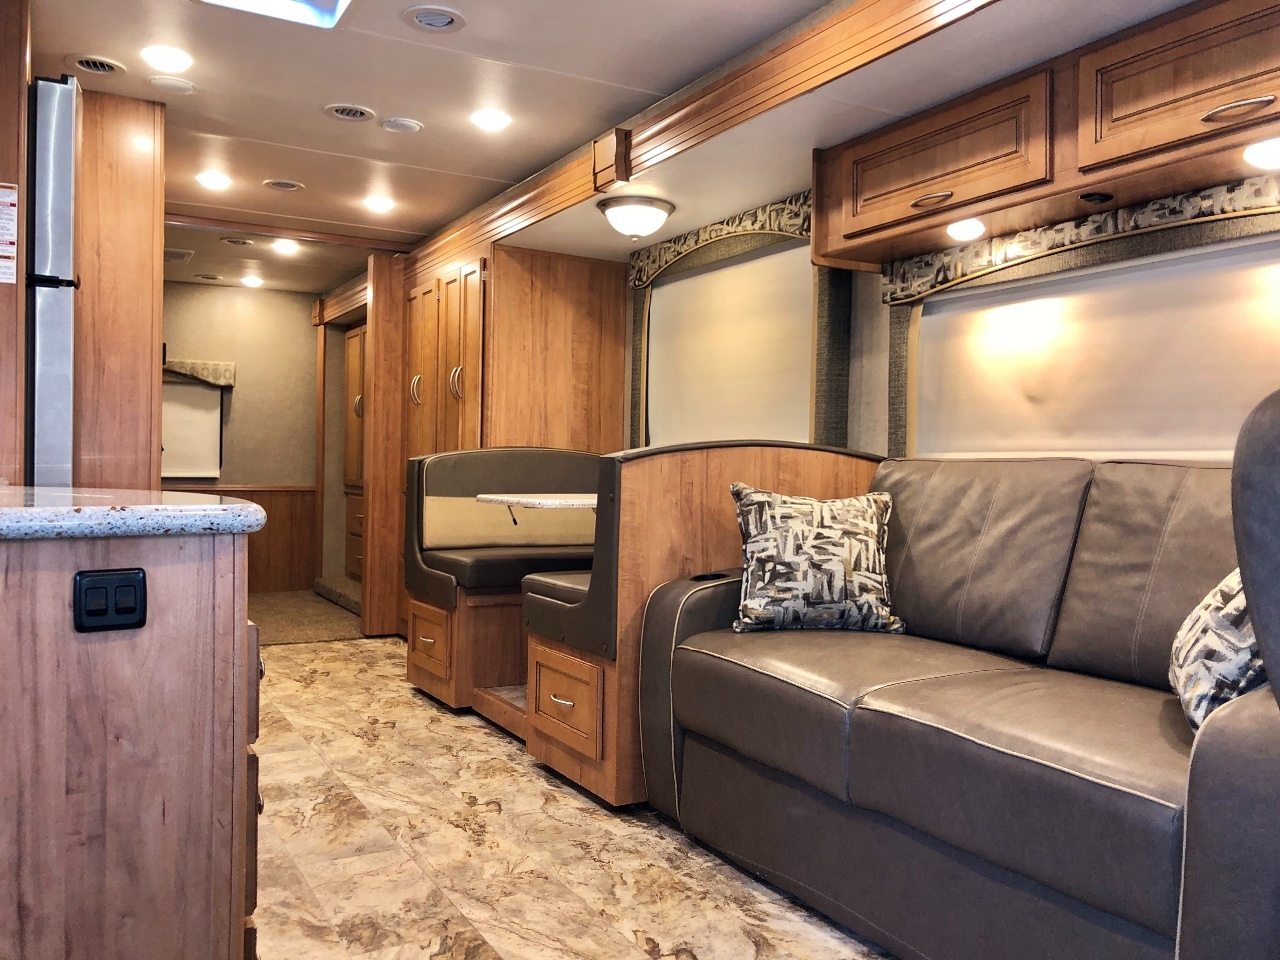 20173a2017 Coachmen Rvs For Sale 11888 Rv Trader Prewire Over Fireplace In Saratoga Ca Mw Home Entertainment Wiring